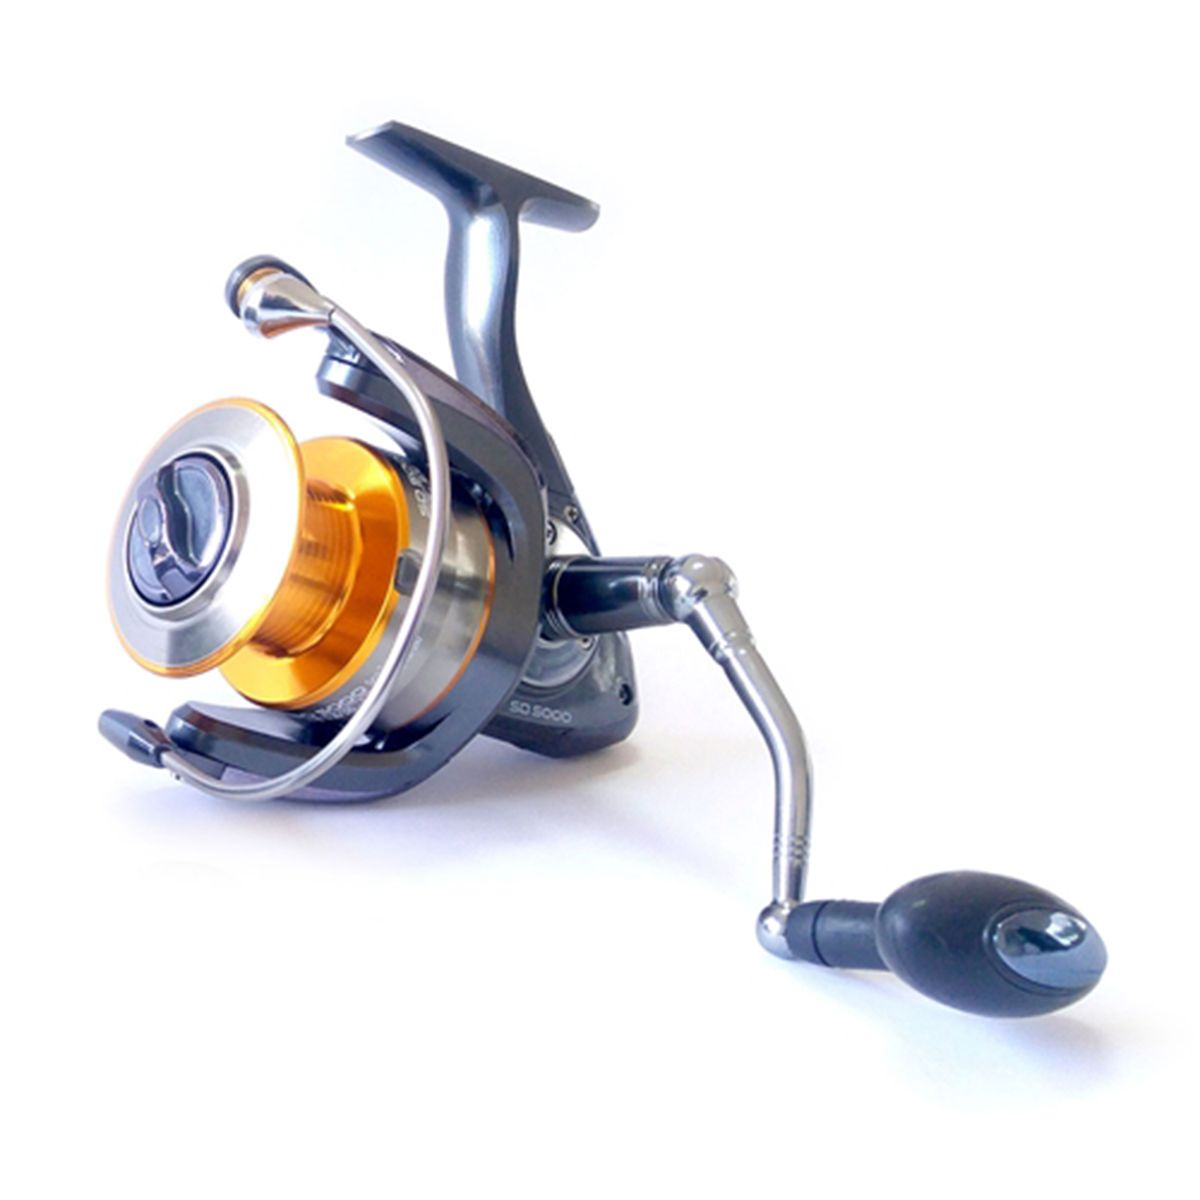 Molinete Pro Tsuri Sode 3000 Rec 5.1:1 Com Carretel Extra  - Pesca Adventure